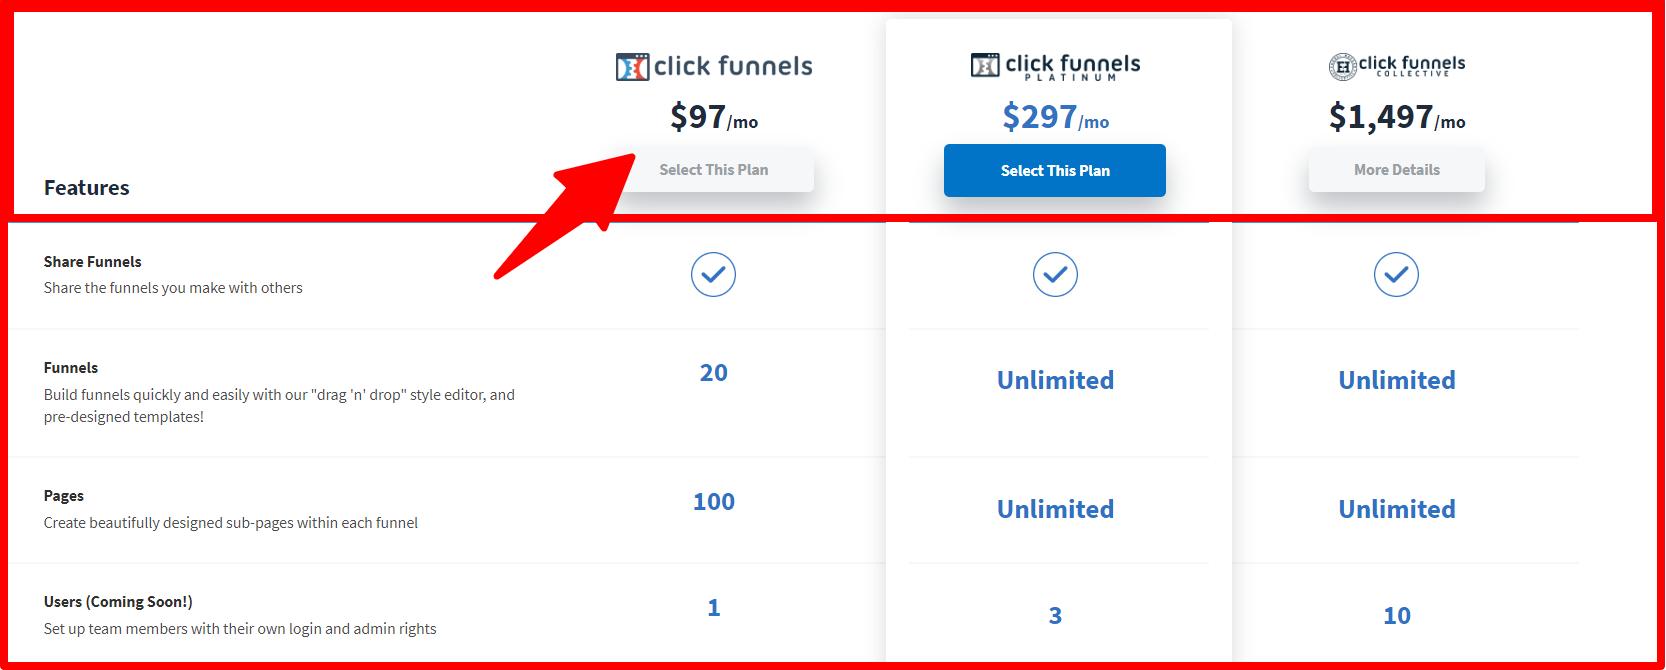 - ClickFunnels Pricing